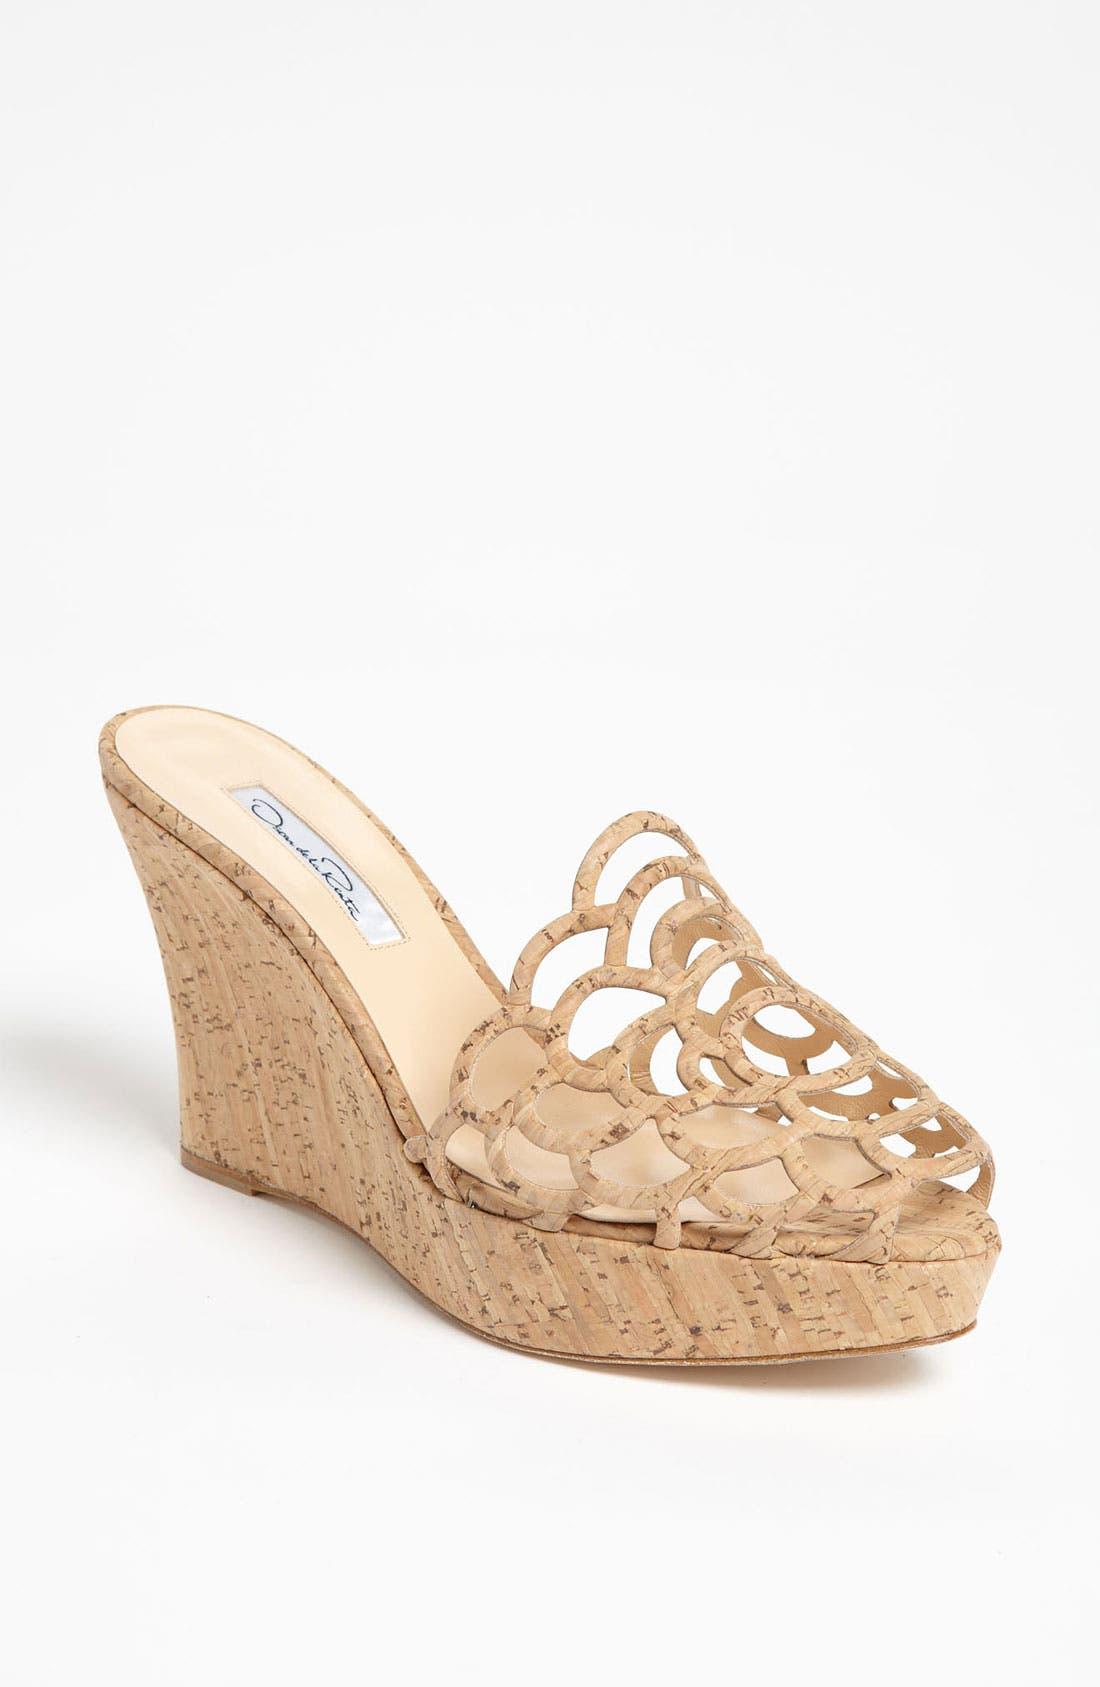 Main Image - Oscar de la Renta 'Virma' Cork Sandal